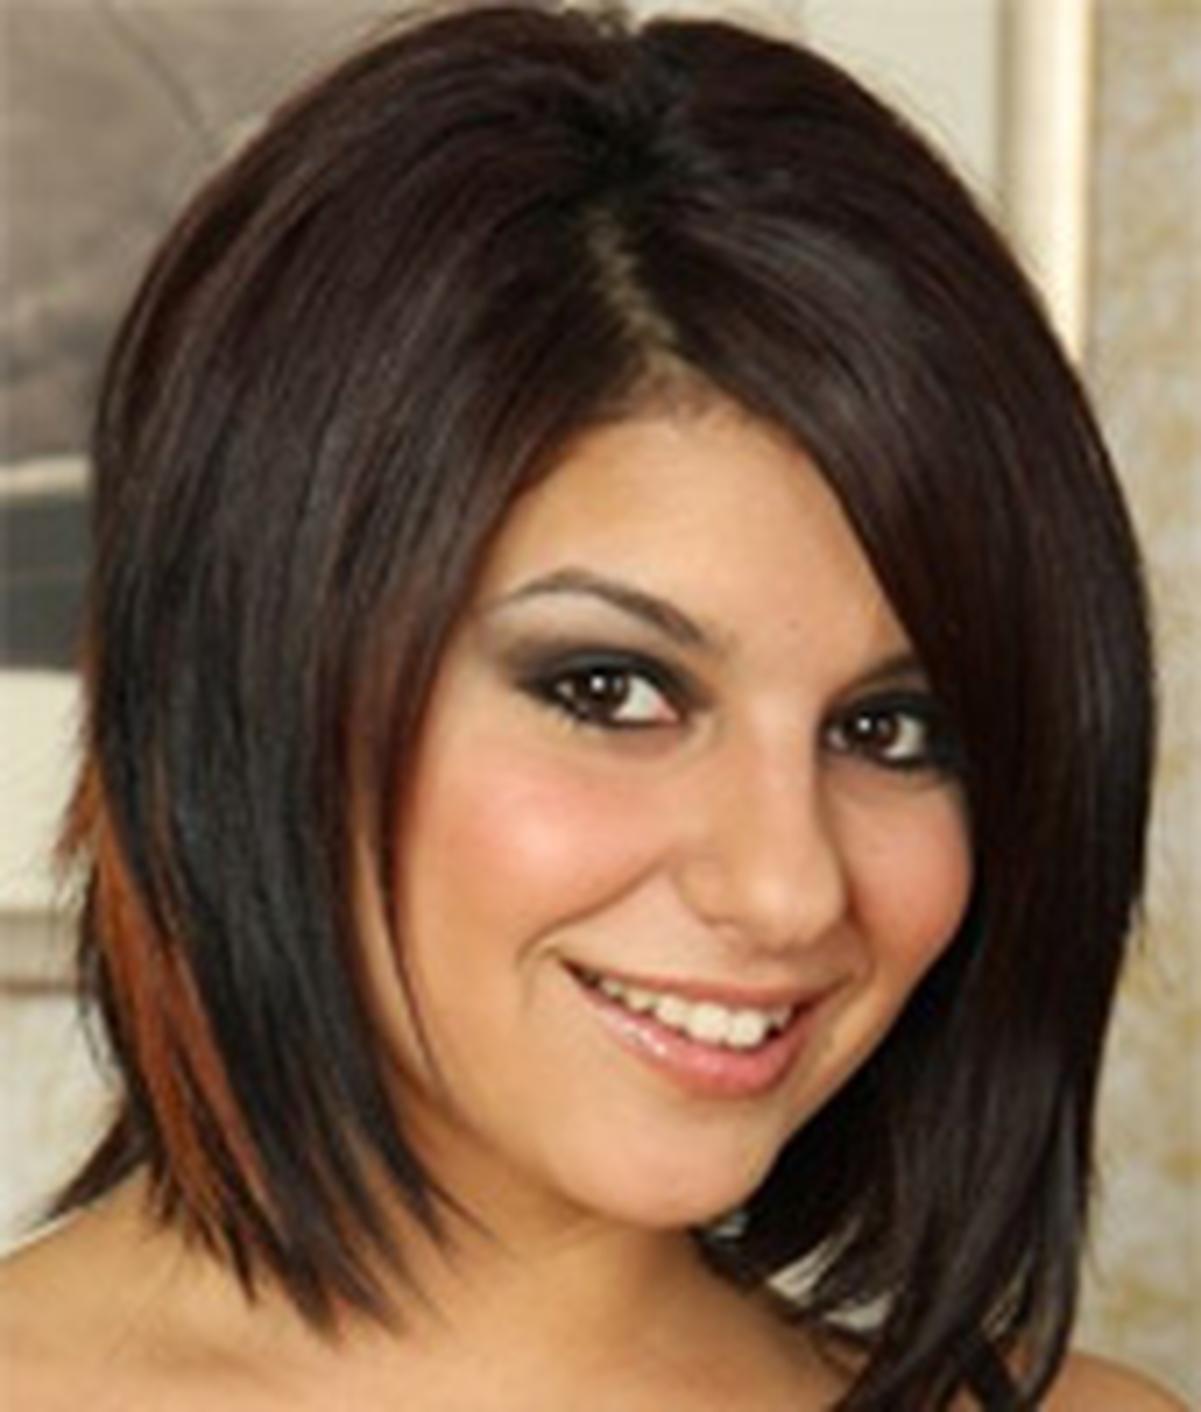 Christina Moure